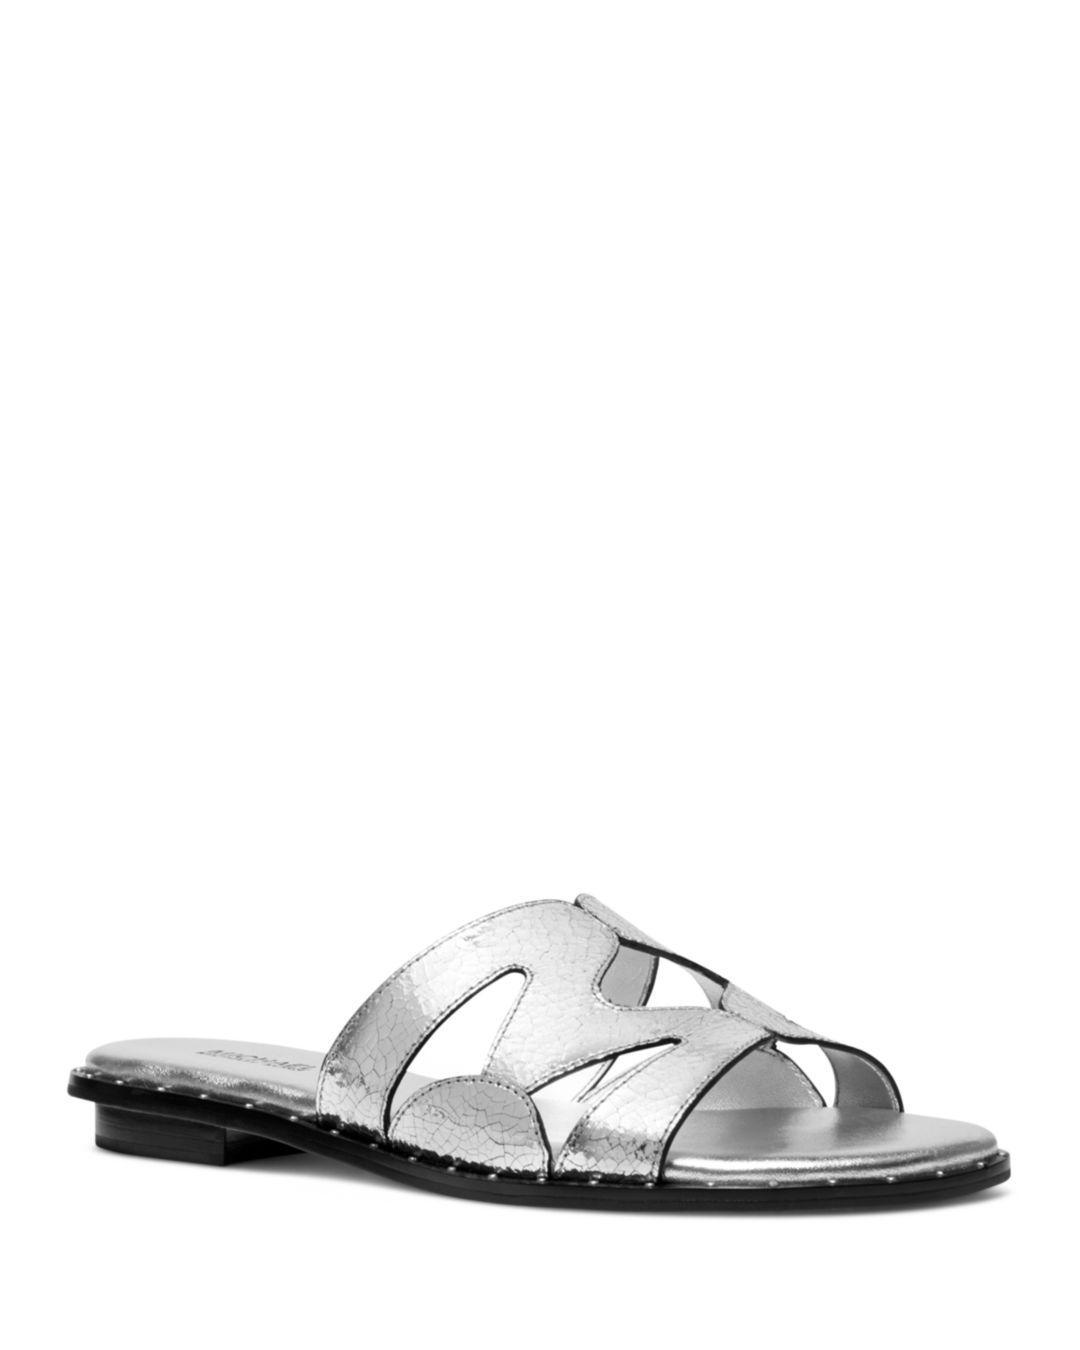 9c5d98e207a7 Lyst - Michael Kors Annalee Metallic Textured Leather Slide in Metallic